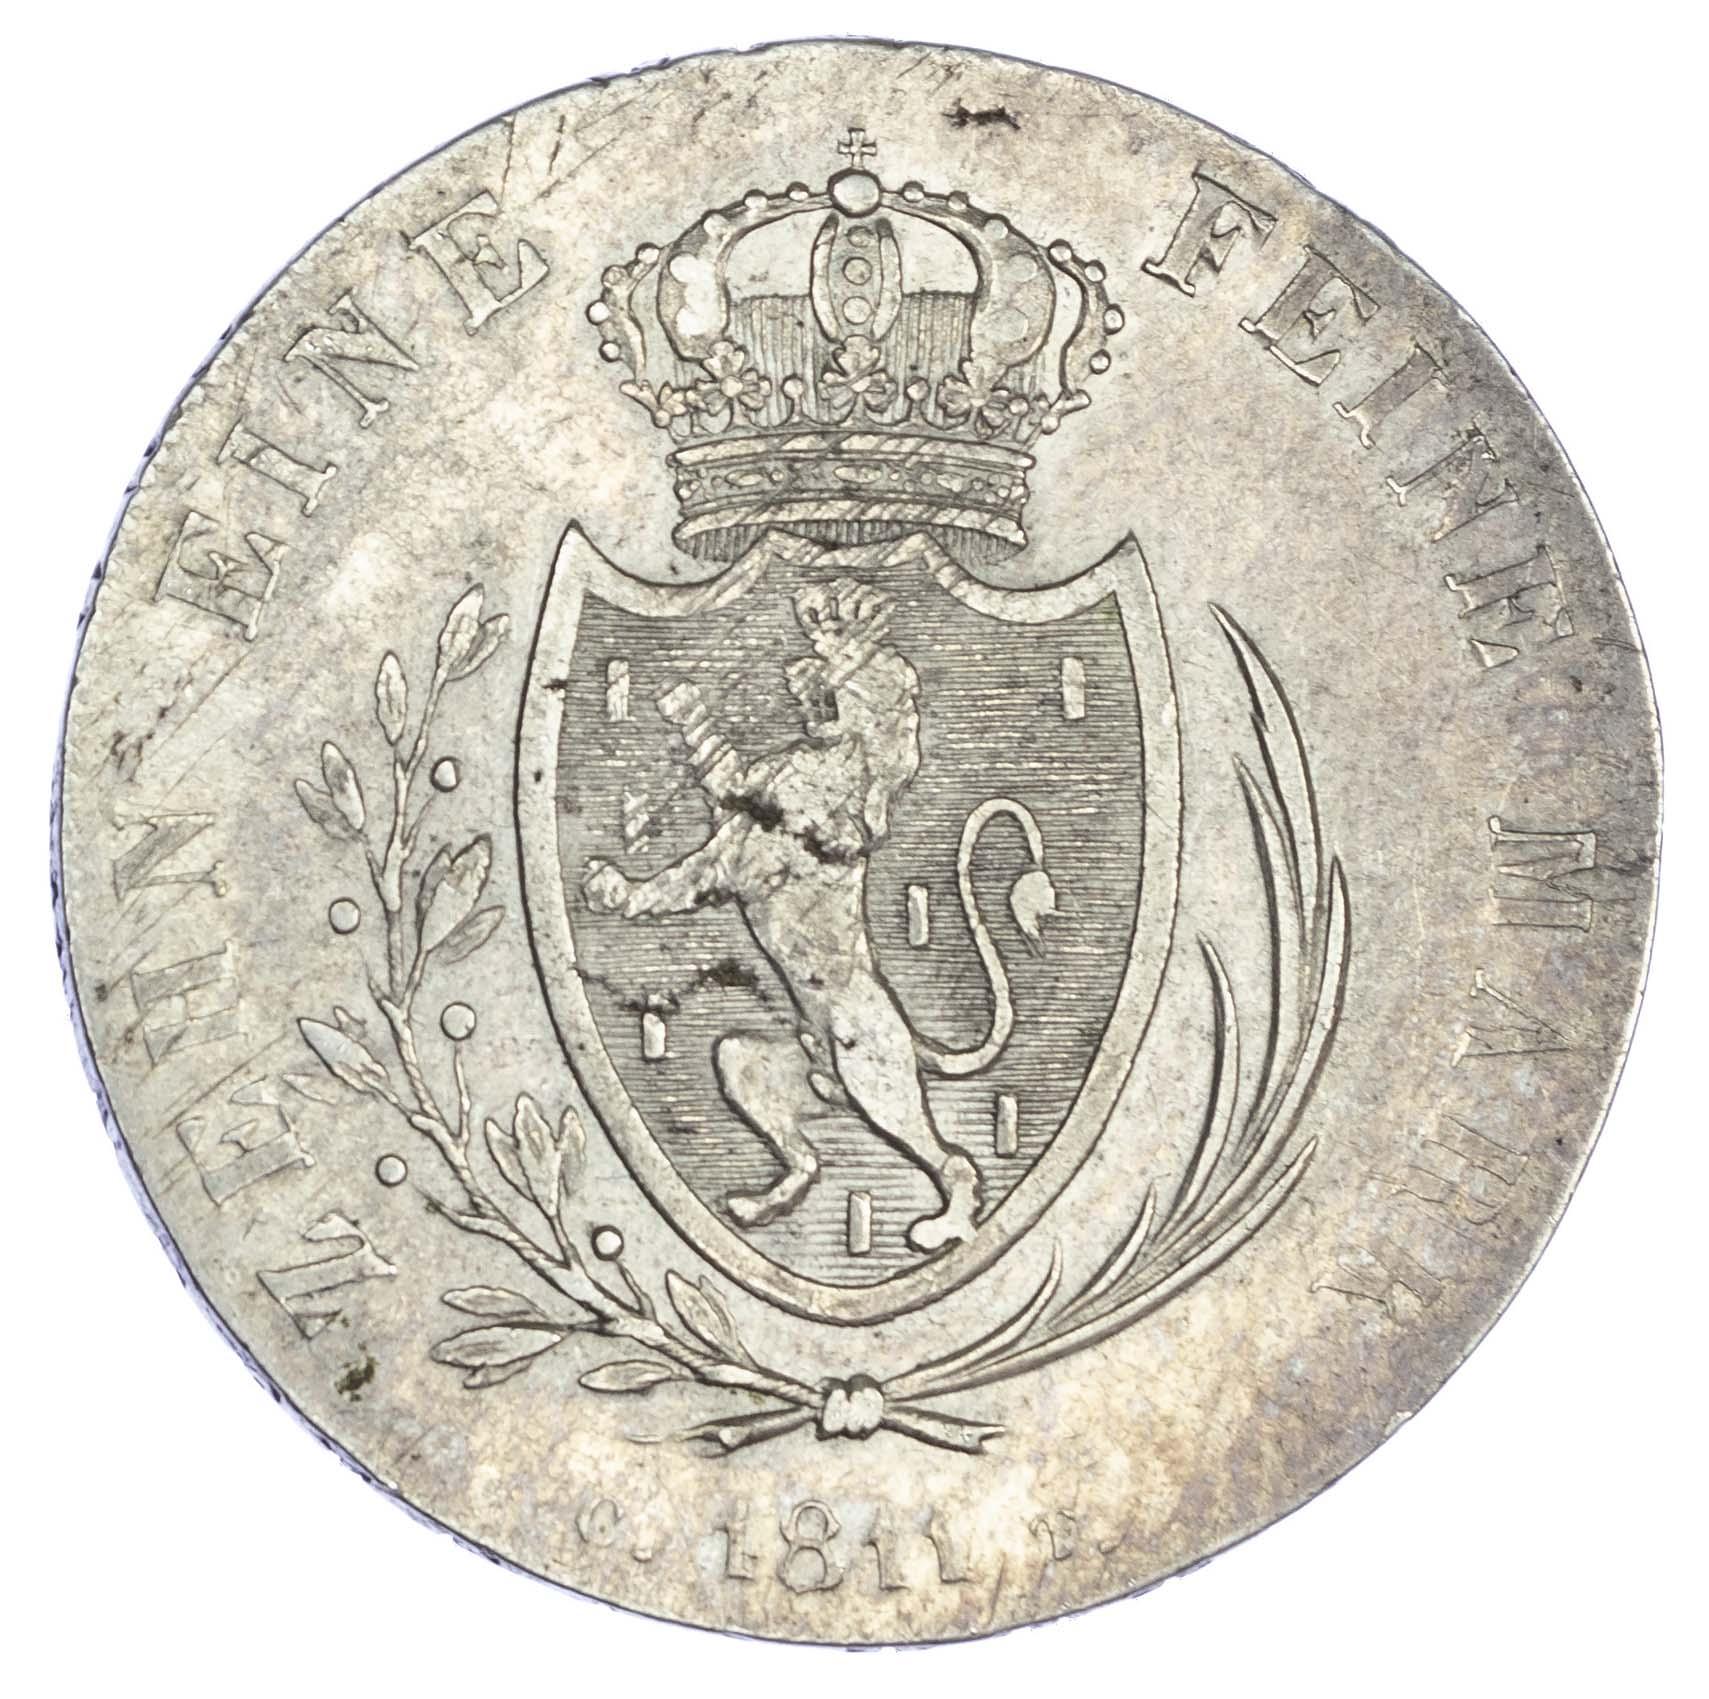 Germany, Nassau-Weilburg, Friederich Wilhelm II (1806-16 AD), silver Taler, 1811